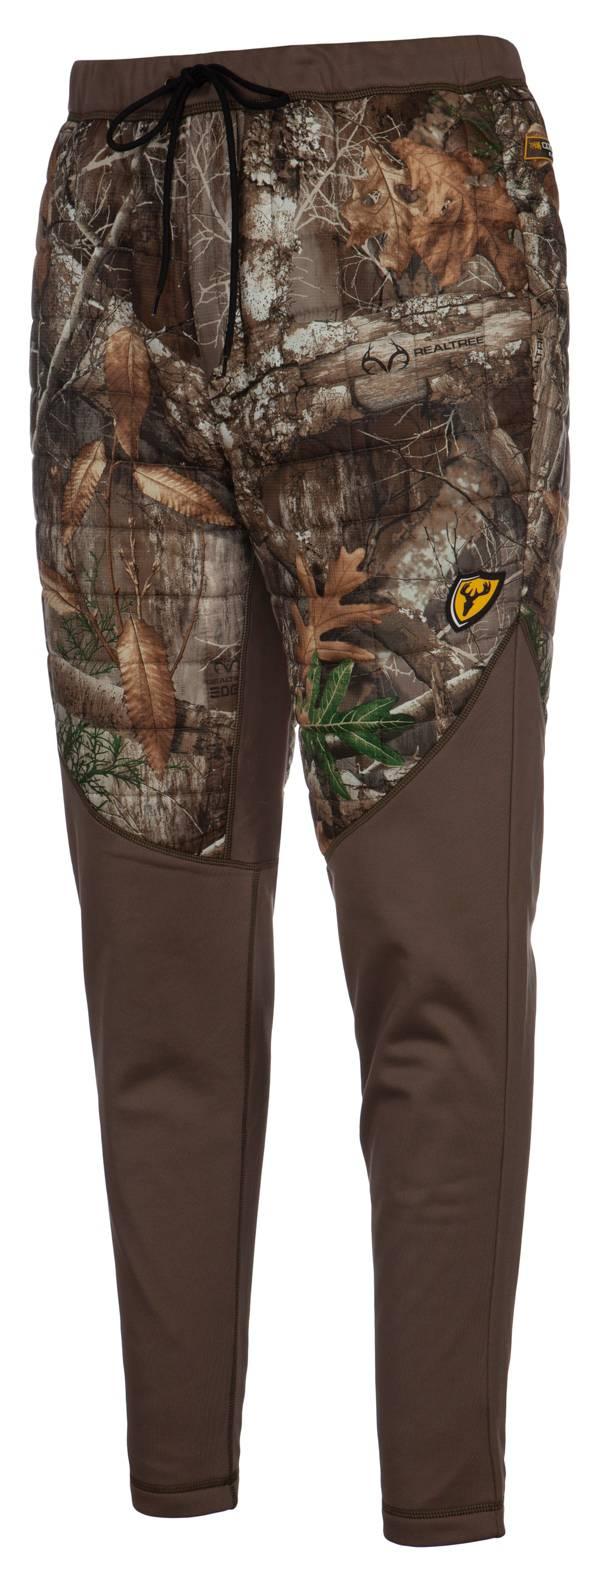 Blocker Outdoors Men's ScentBlocker Thermal Hybrid Pants product image